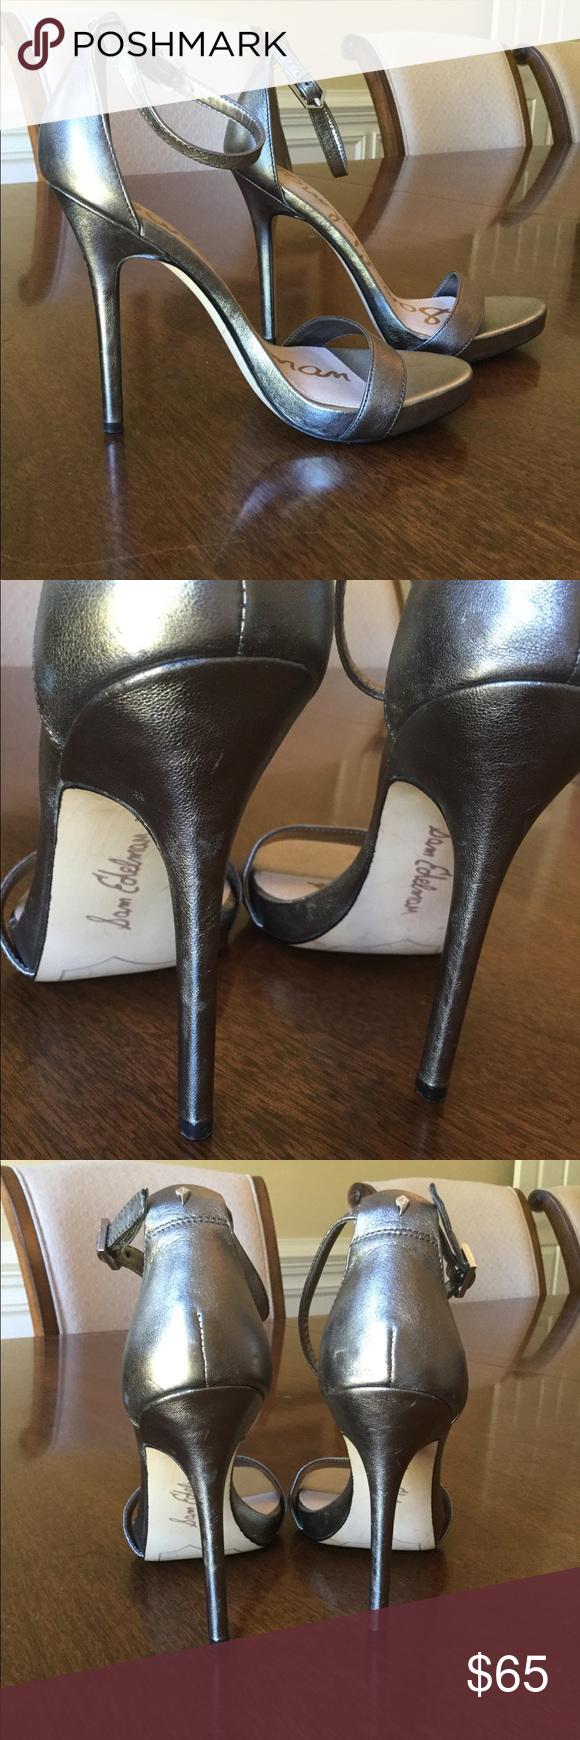 e7eb30682 SAM EDELMAN Ariella Heeled Sandal NEW Sz.6 Sam Edelman silver pewter open  toe heeled